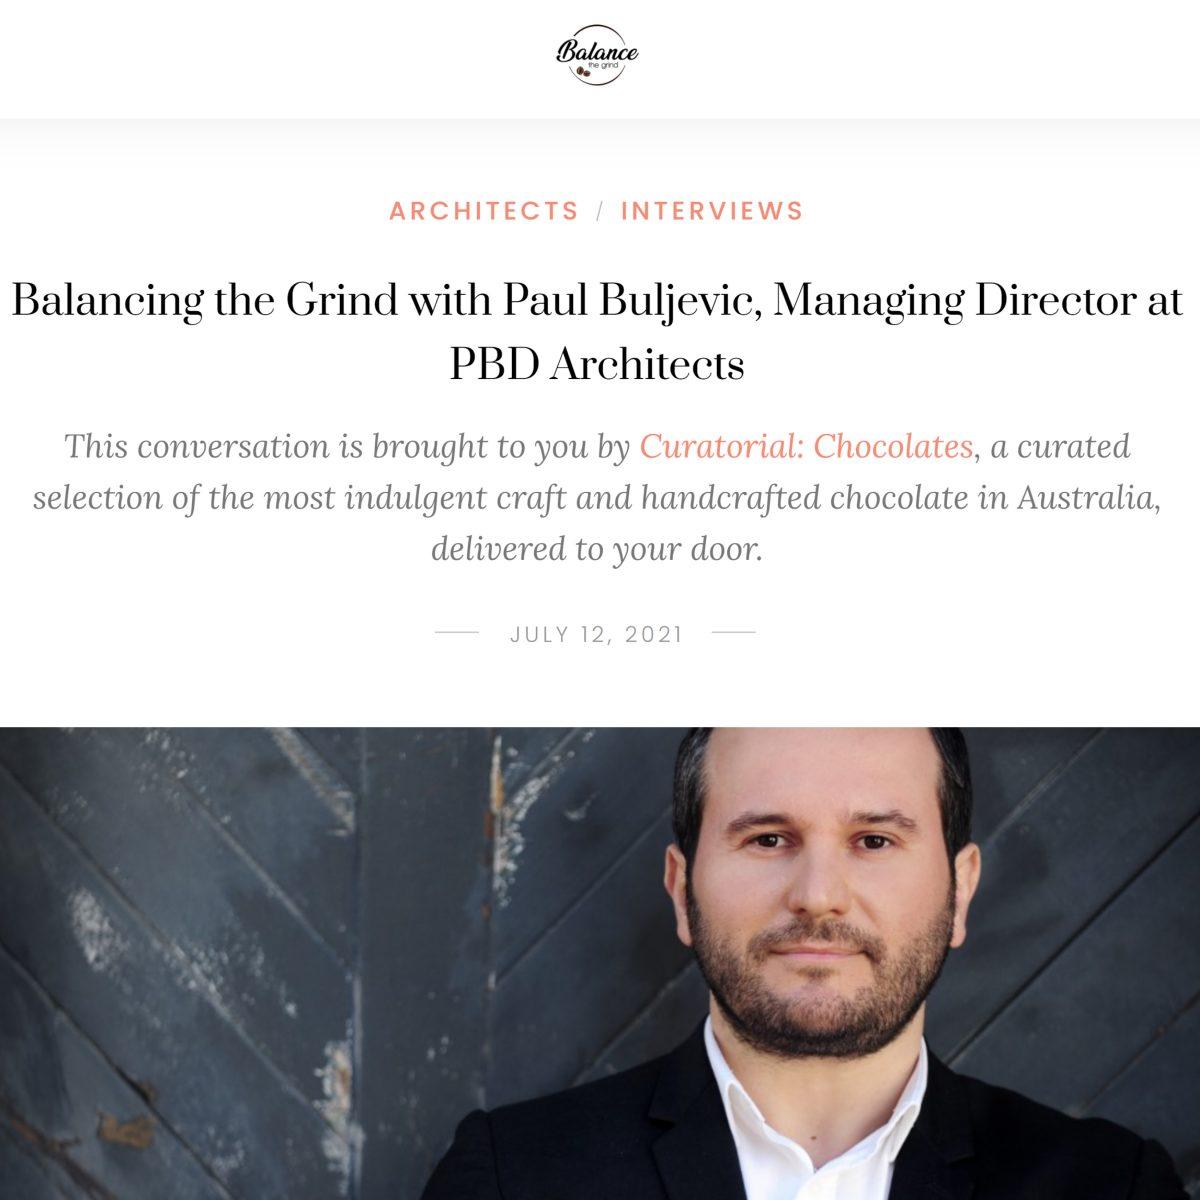 Balancing the Grind with Paul Buljevic, Managing Director at PBD Architects